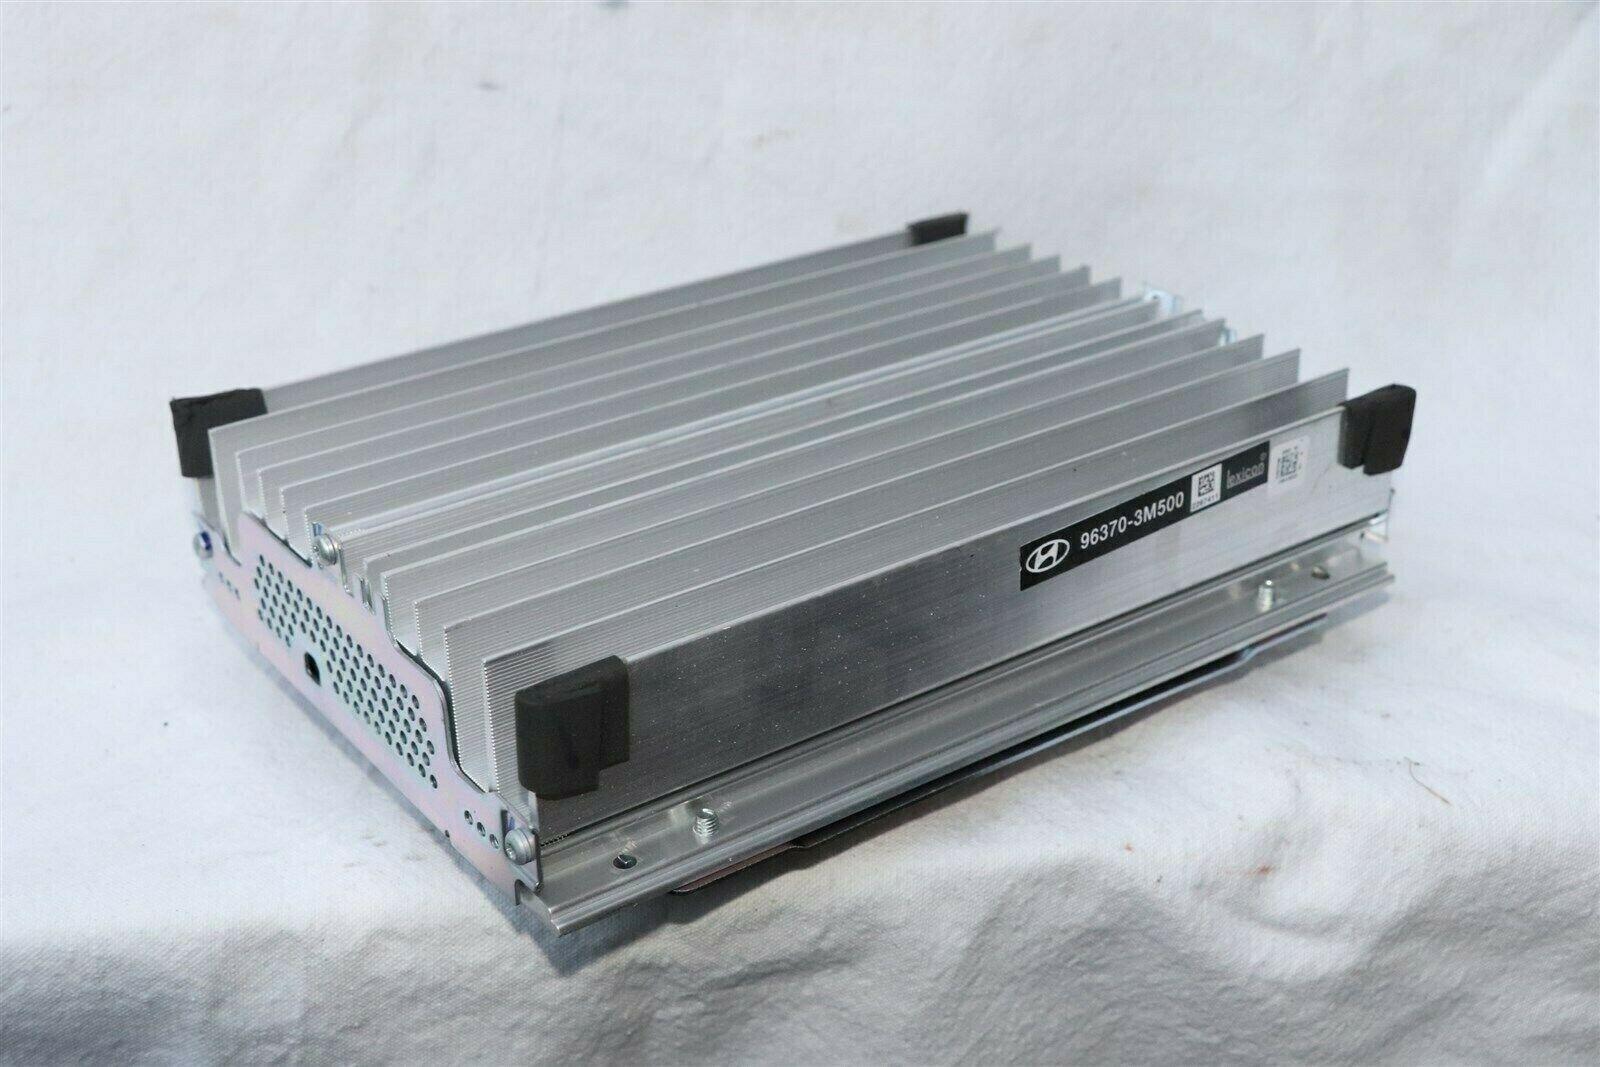 Hyundai Genesis Lexicon Radio Audio Amp Amplifier 96370-3M500